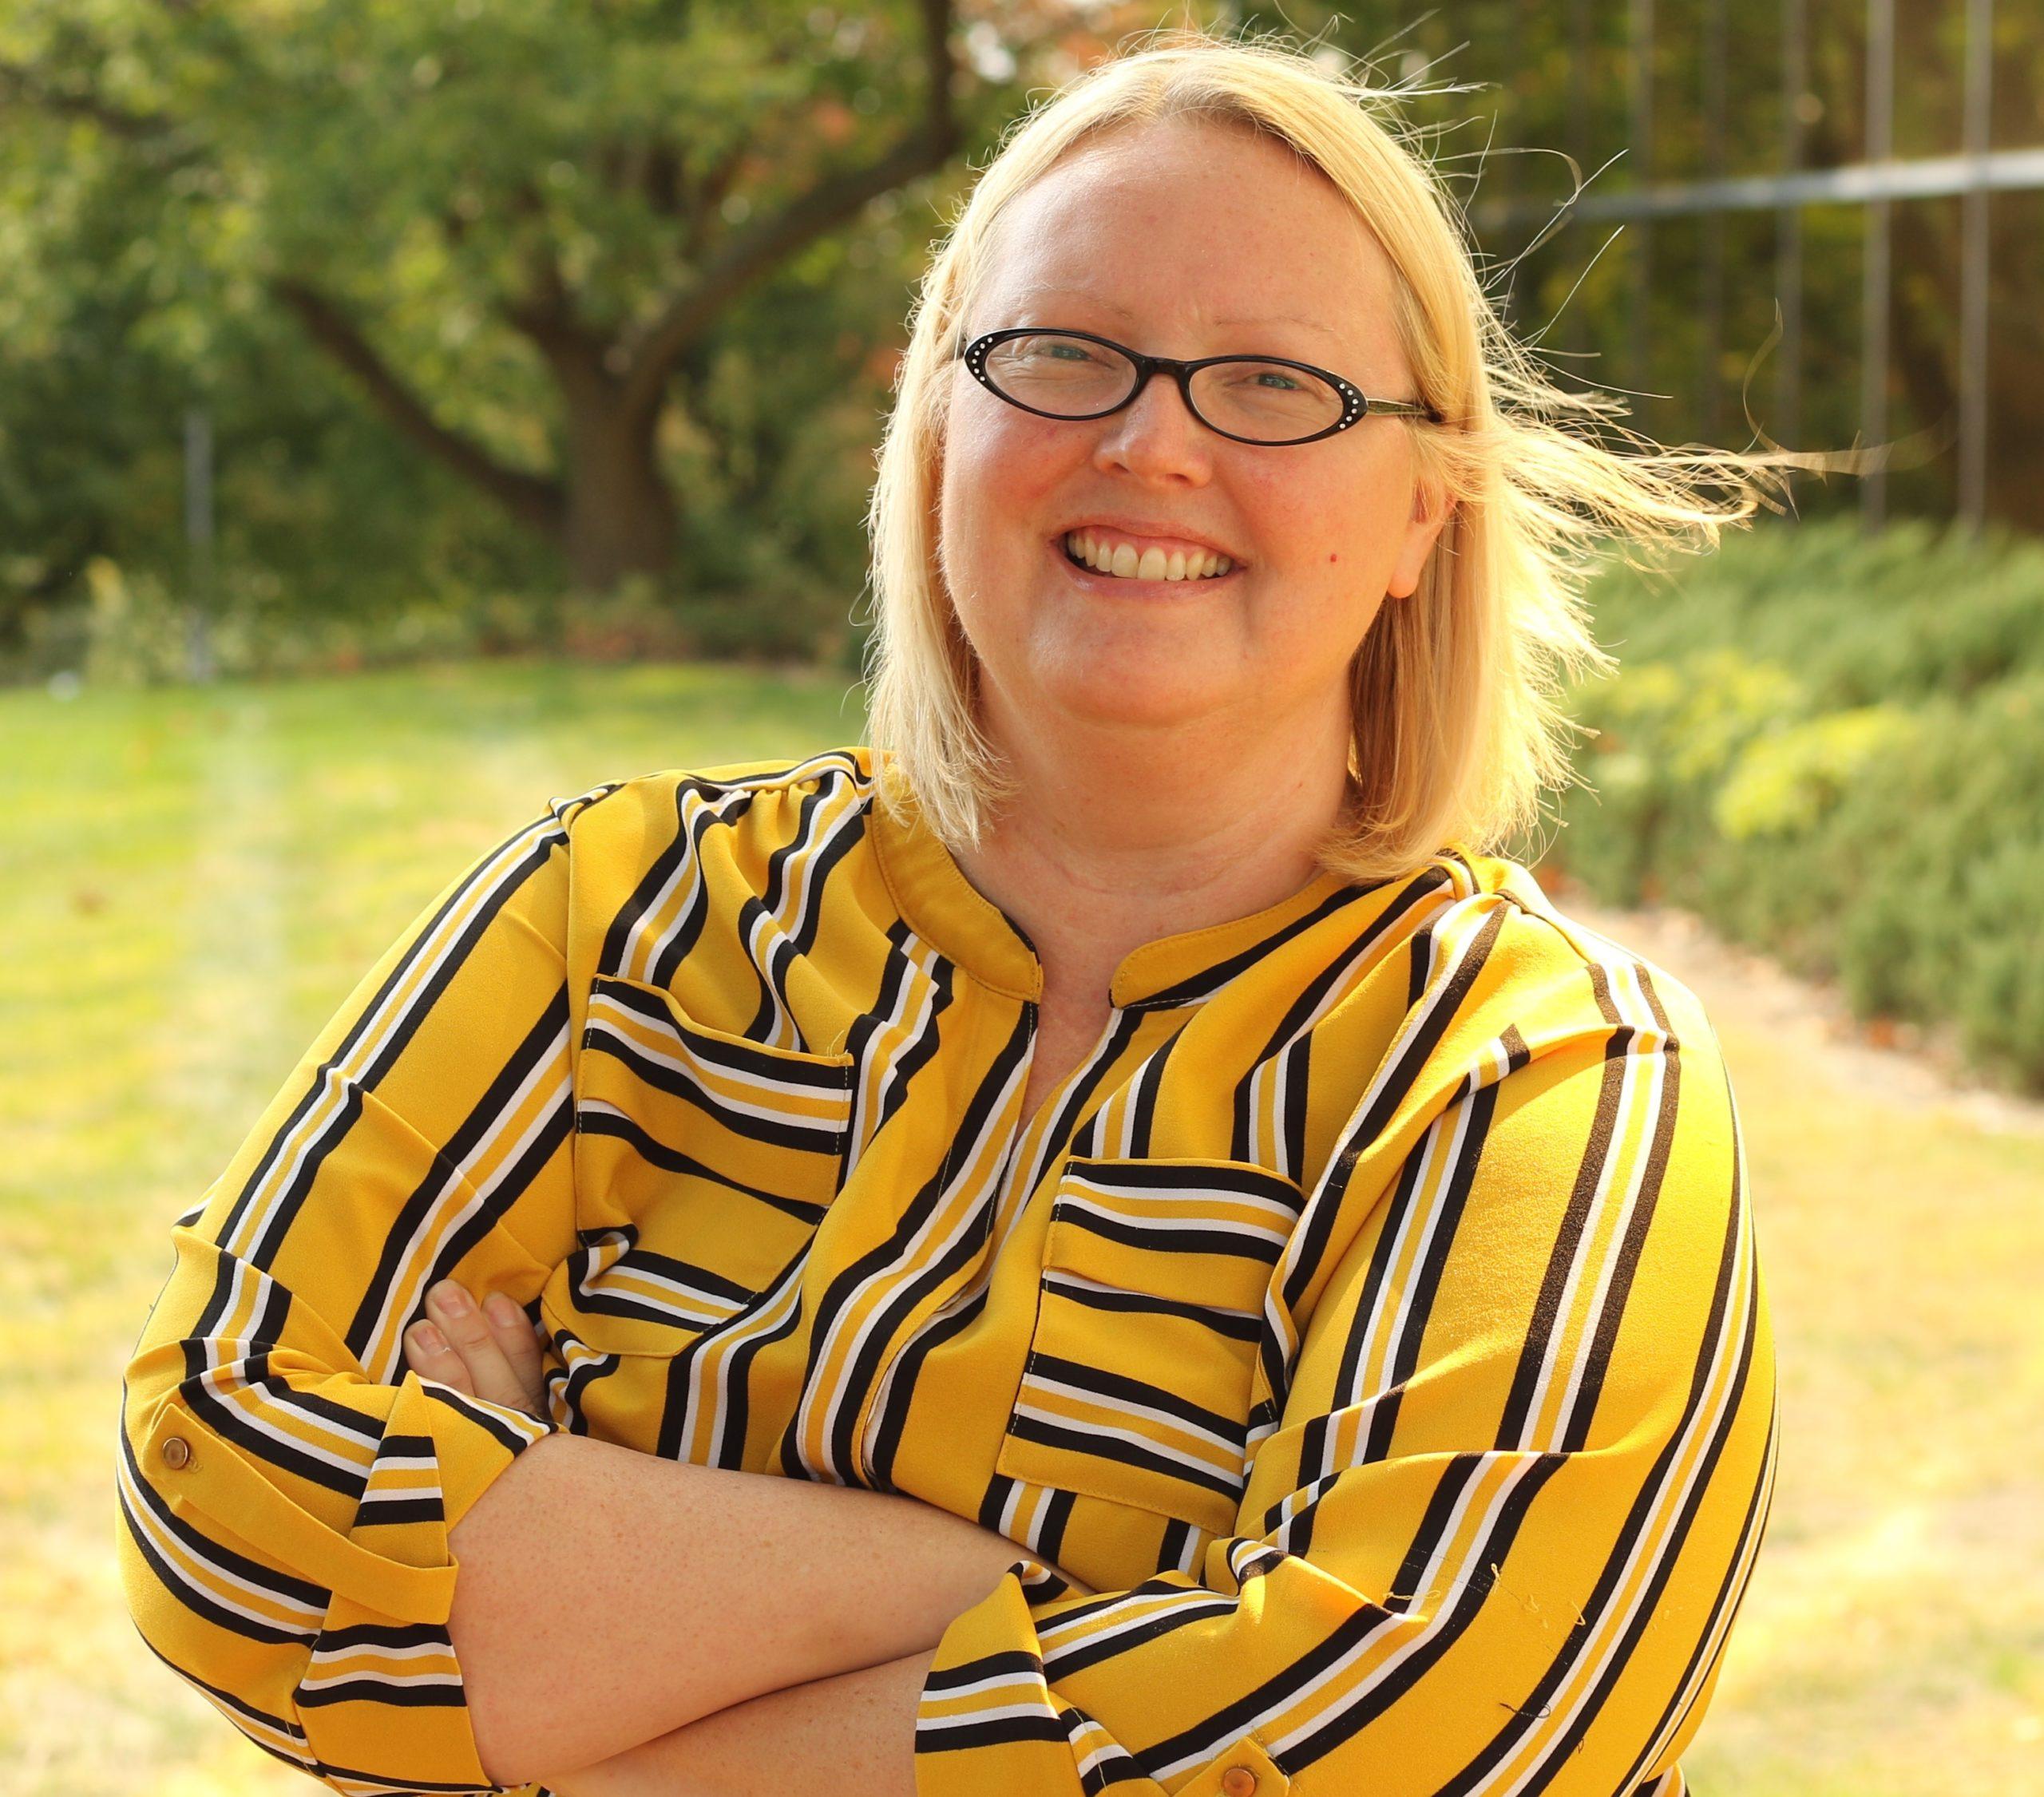 Jenifer Lara : Iowa Department of Agriculture and Land Stewardship